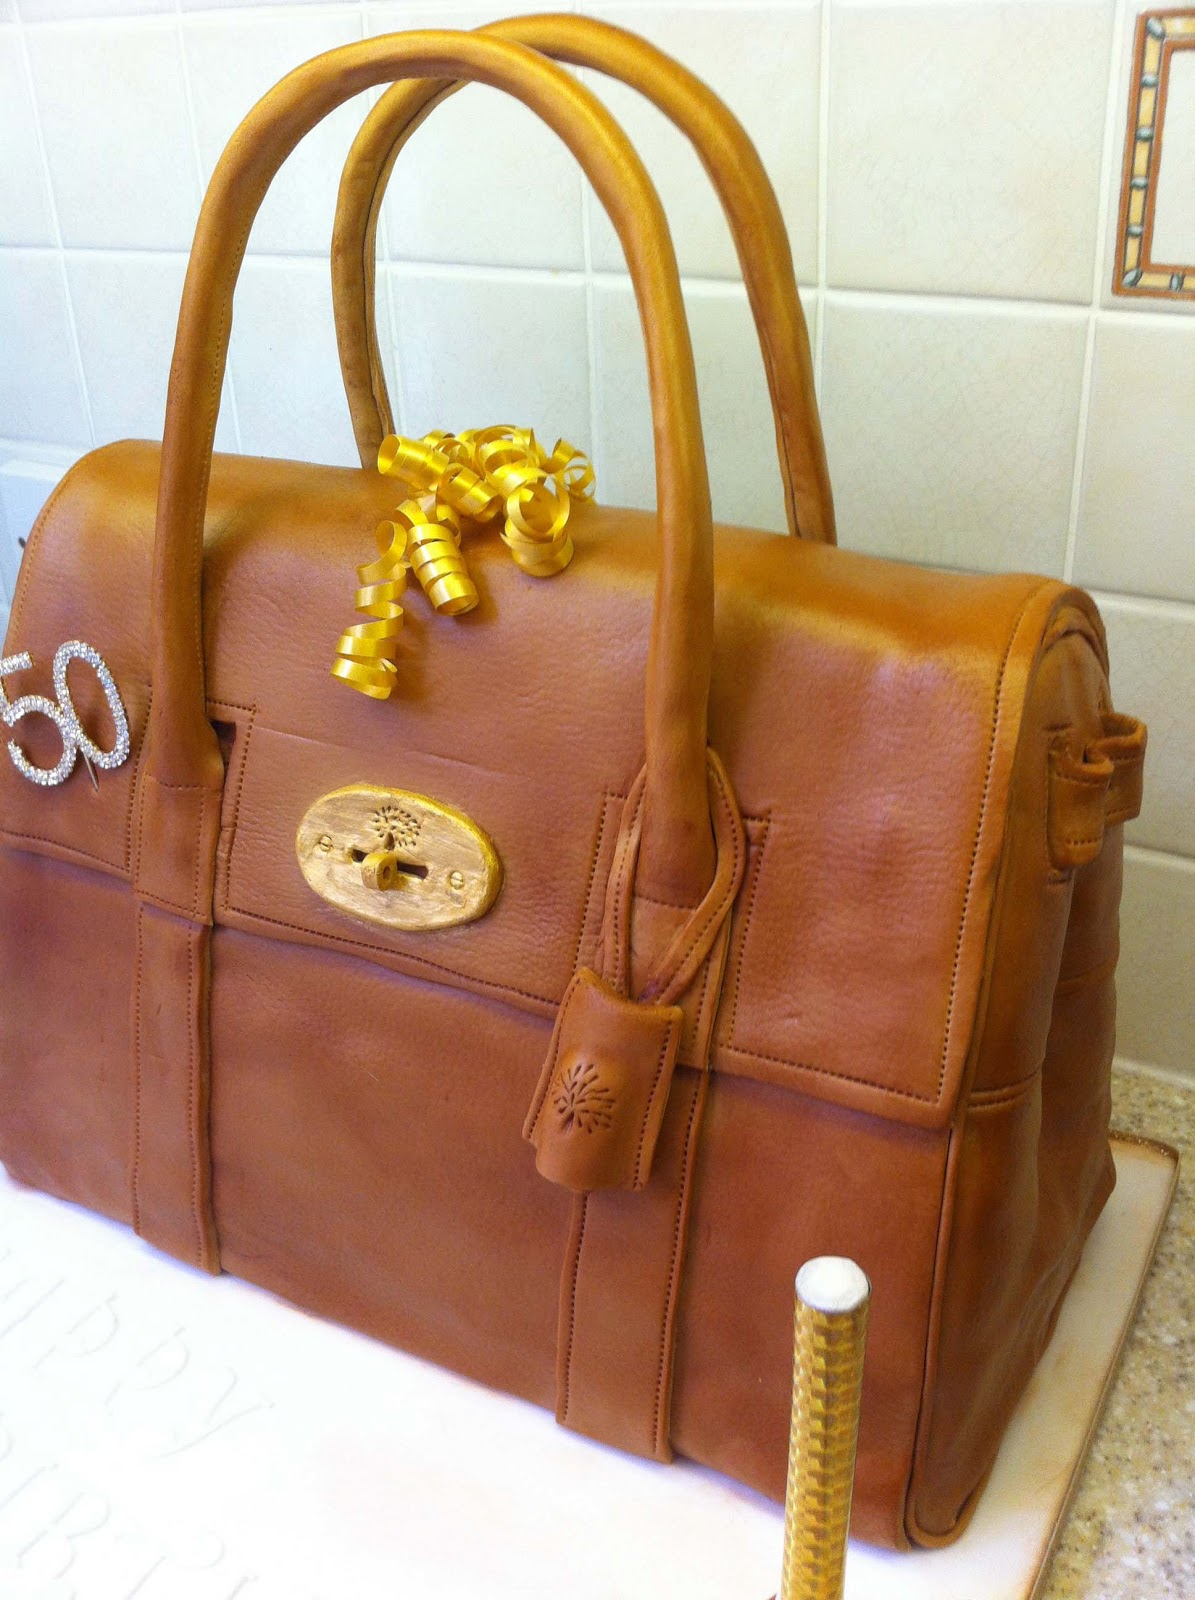 Snowballs In Summer My Biggest Cake To Date Aka The Handbag